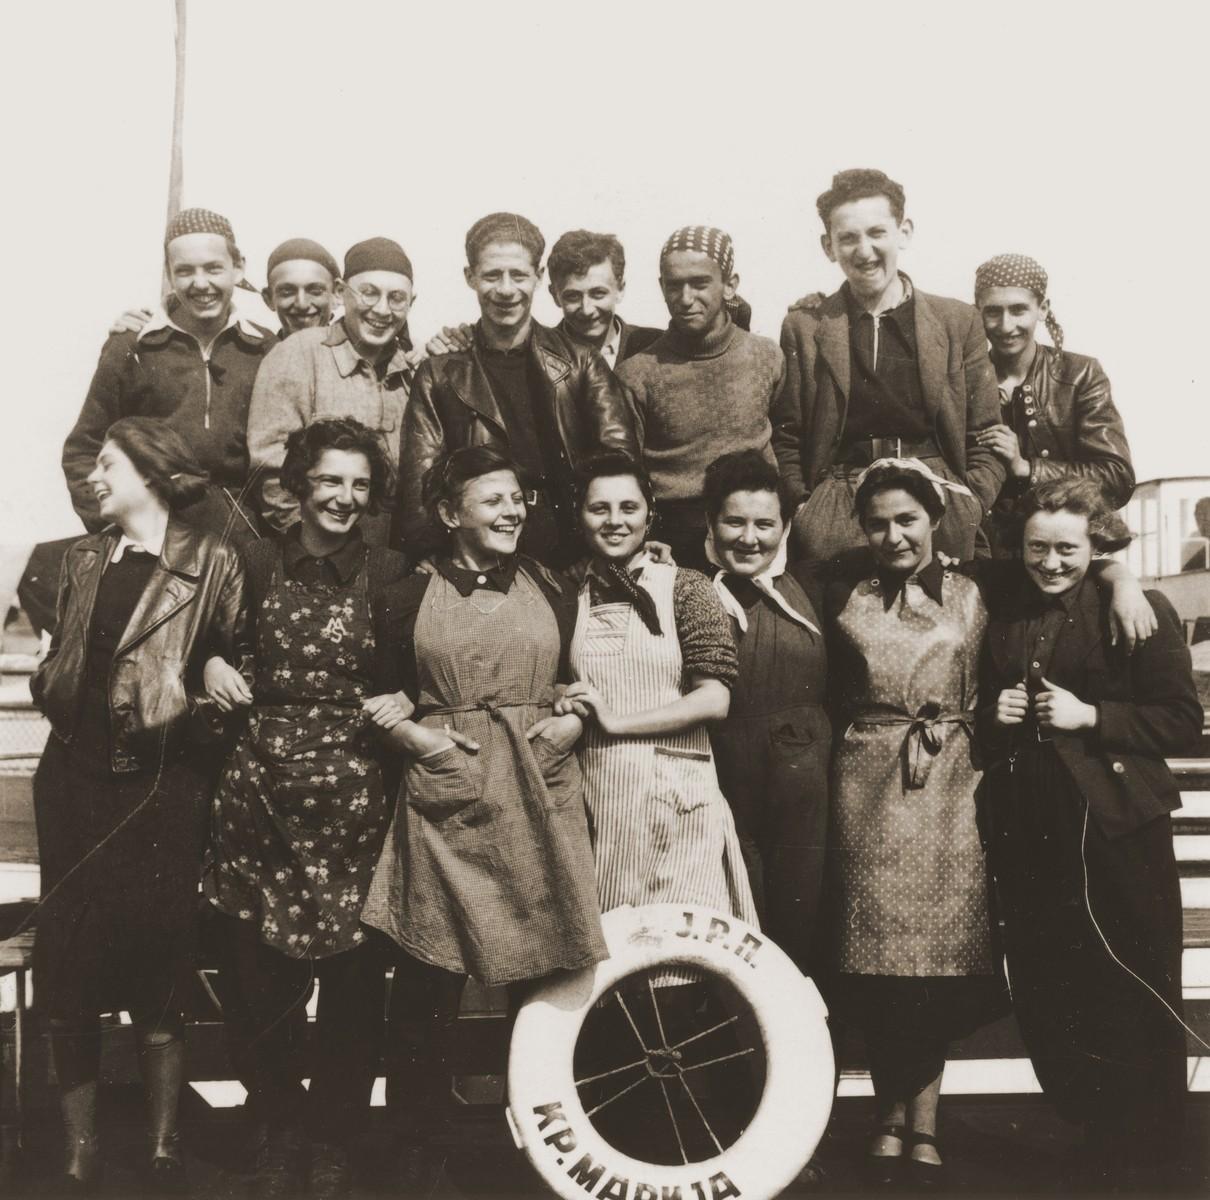 Group portrait of members of the Hashomer Hatzair Zionist youth aboard one of the riverboats (the Kraljica Marija) of the Kladovo transport.  Pictured in the top row from left to right are Zeev Kulka, Josef Cohen, Dov Eshel, Erich Nachhaeuser, Max Stricker, Yehezkel Tanenbaum, Arieh Erez and Avi Marienberg.  In the front row are Margalit Figer, Yael Pagi, Batya Horovitz, Ruth Galilee, Shoshana Dukes, Hannah Rosenwasser and Miriam Pick.